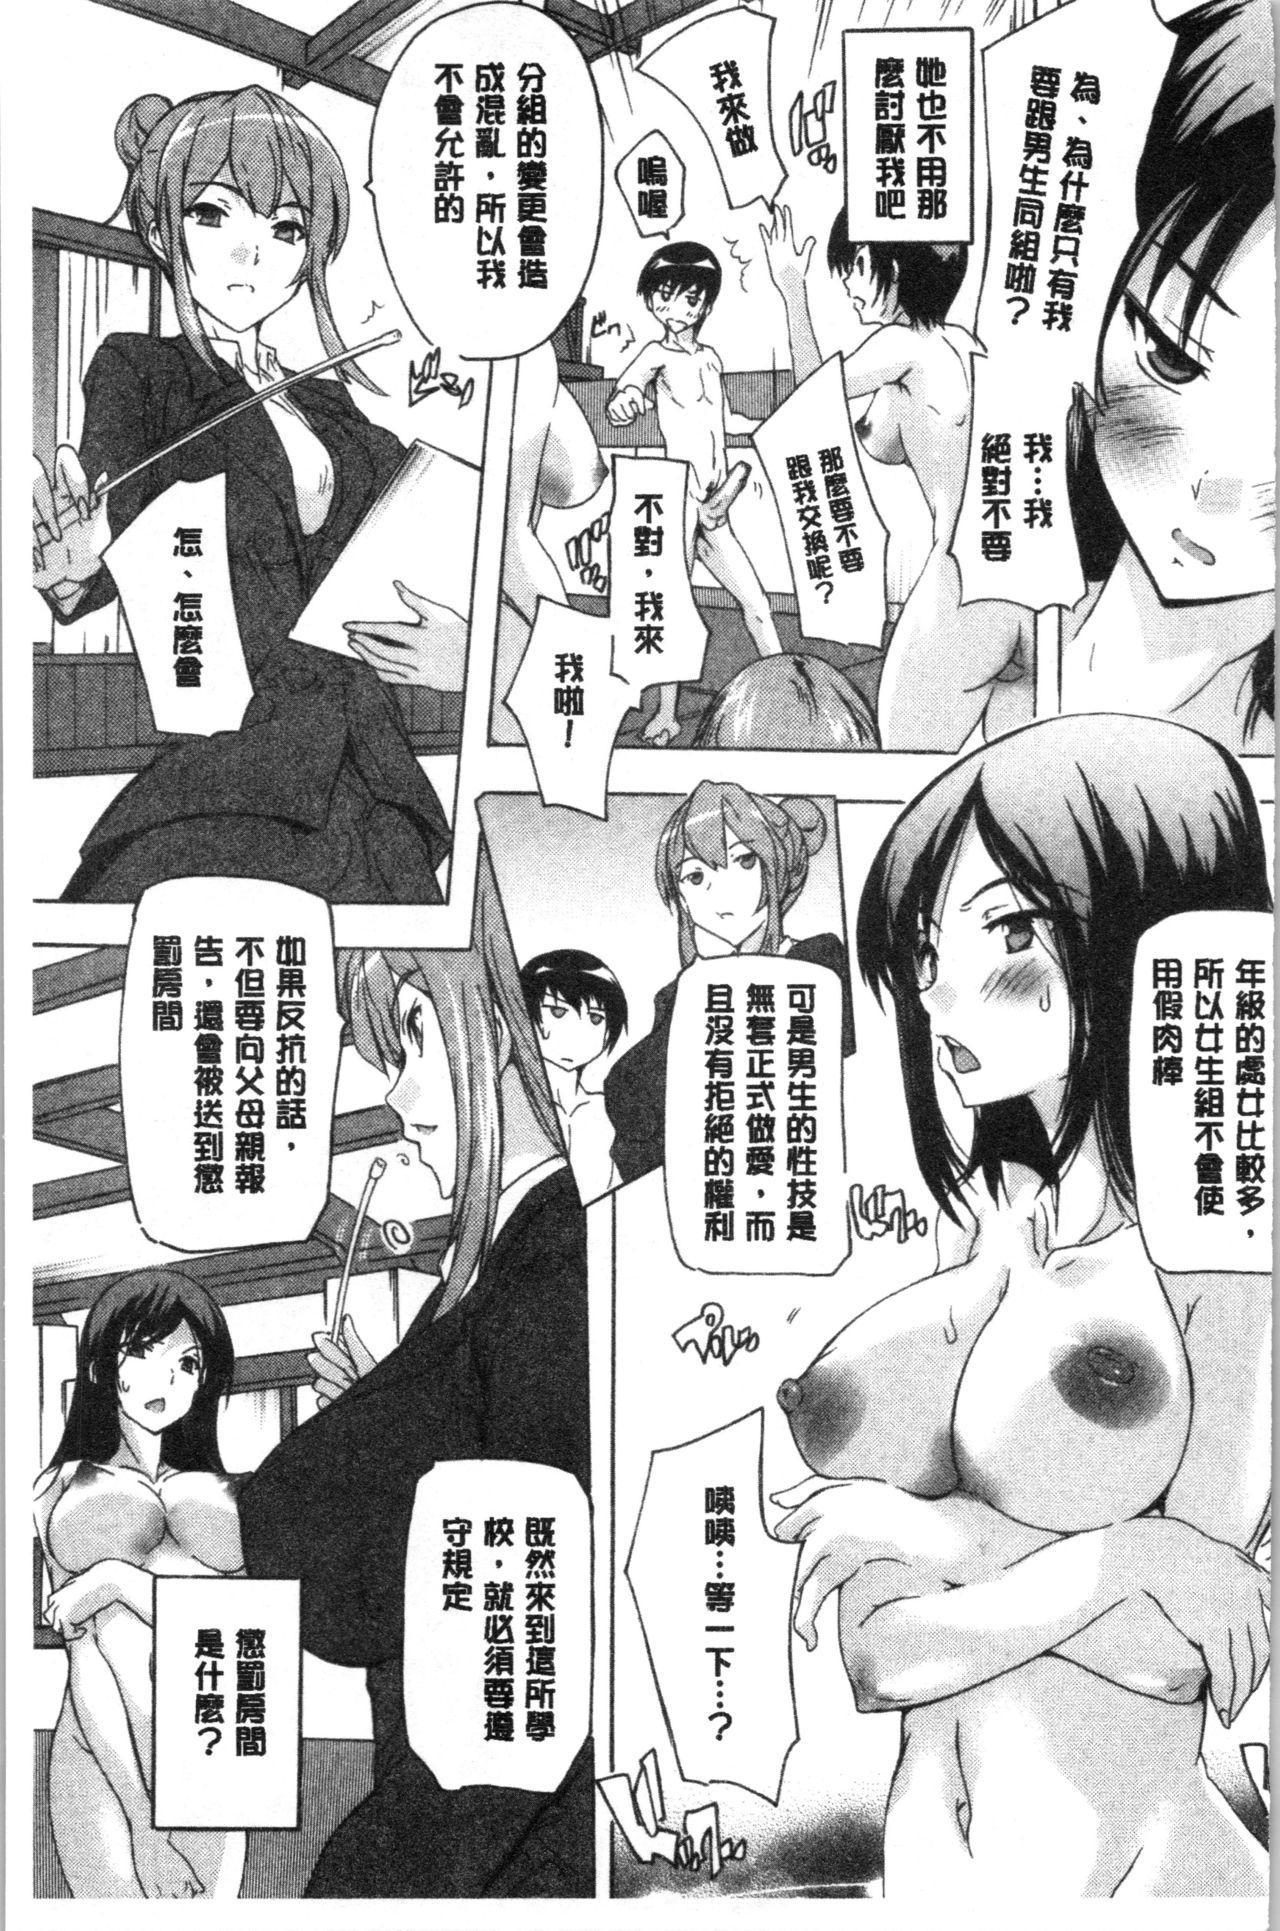 [Natsuka Q-Ya] Hisshuu!! Sex-bu - SEIGI-DO The Ultimate Martial Arts   必修!!性愛淫交部 [Chinese] 43